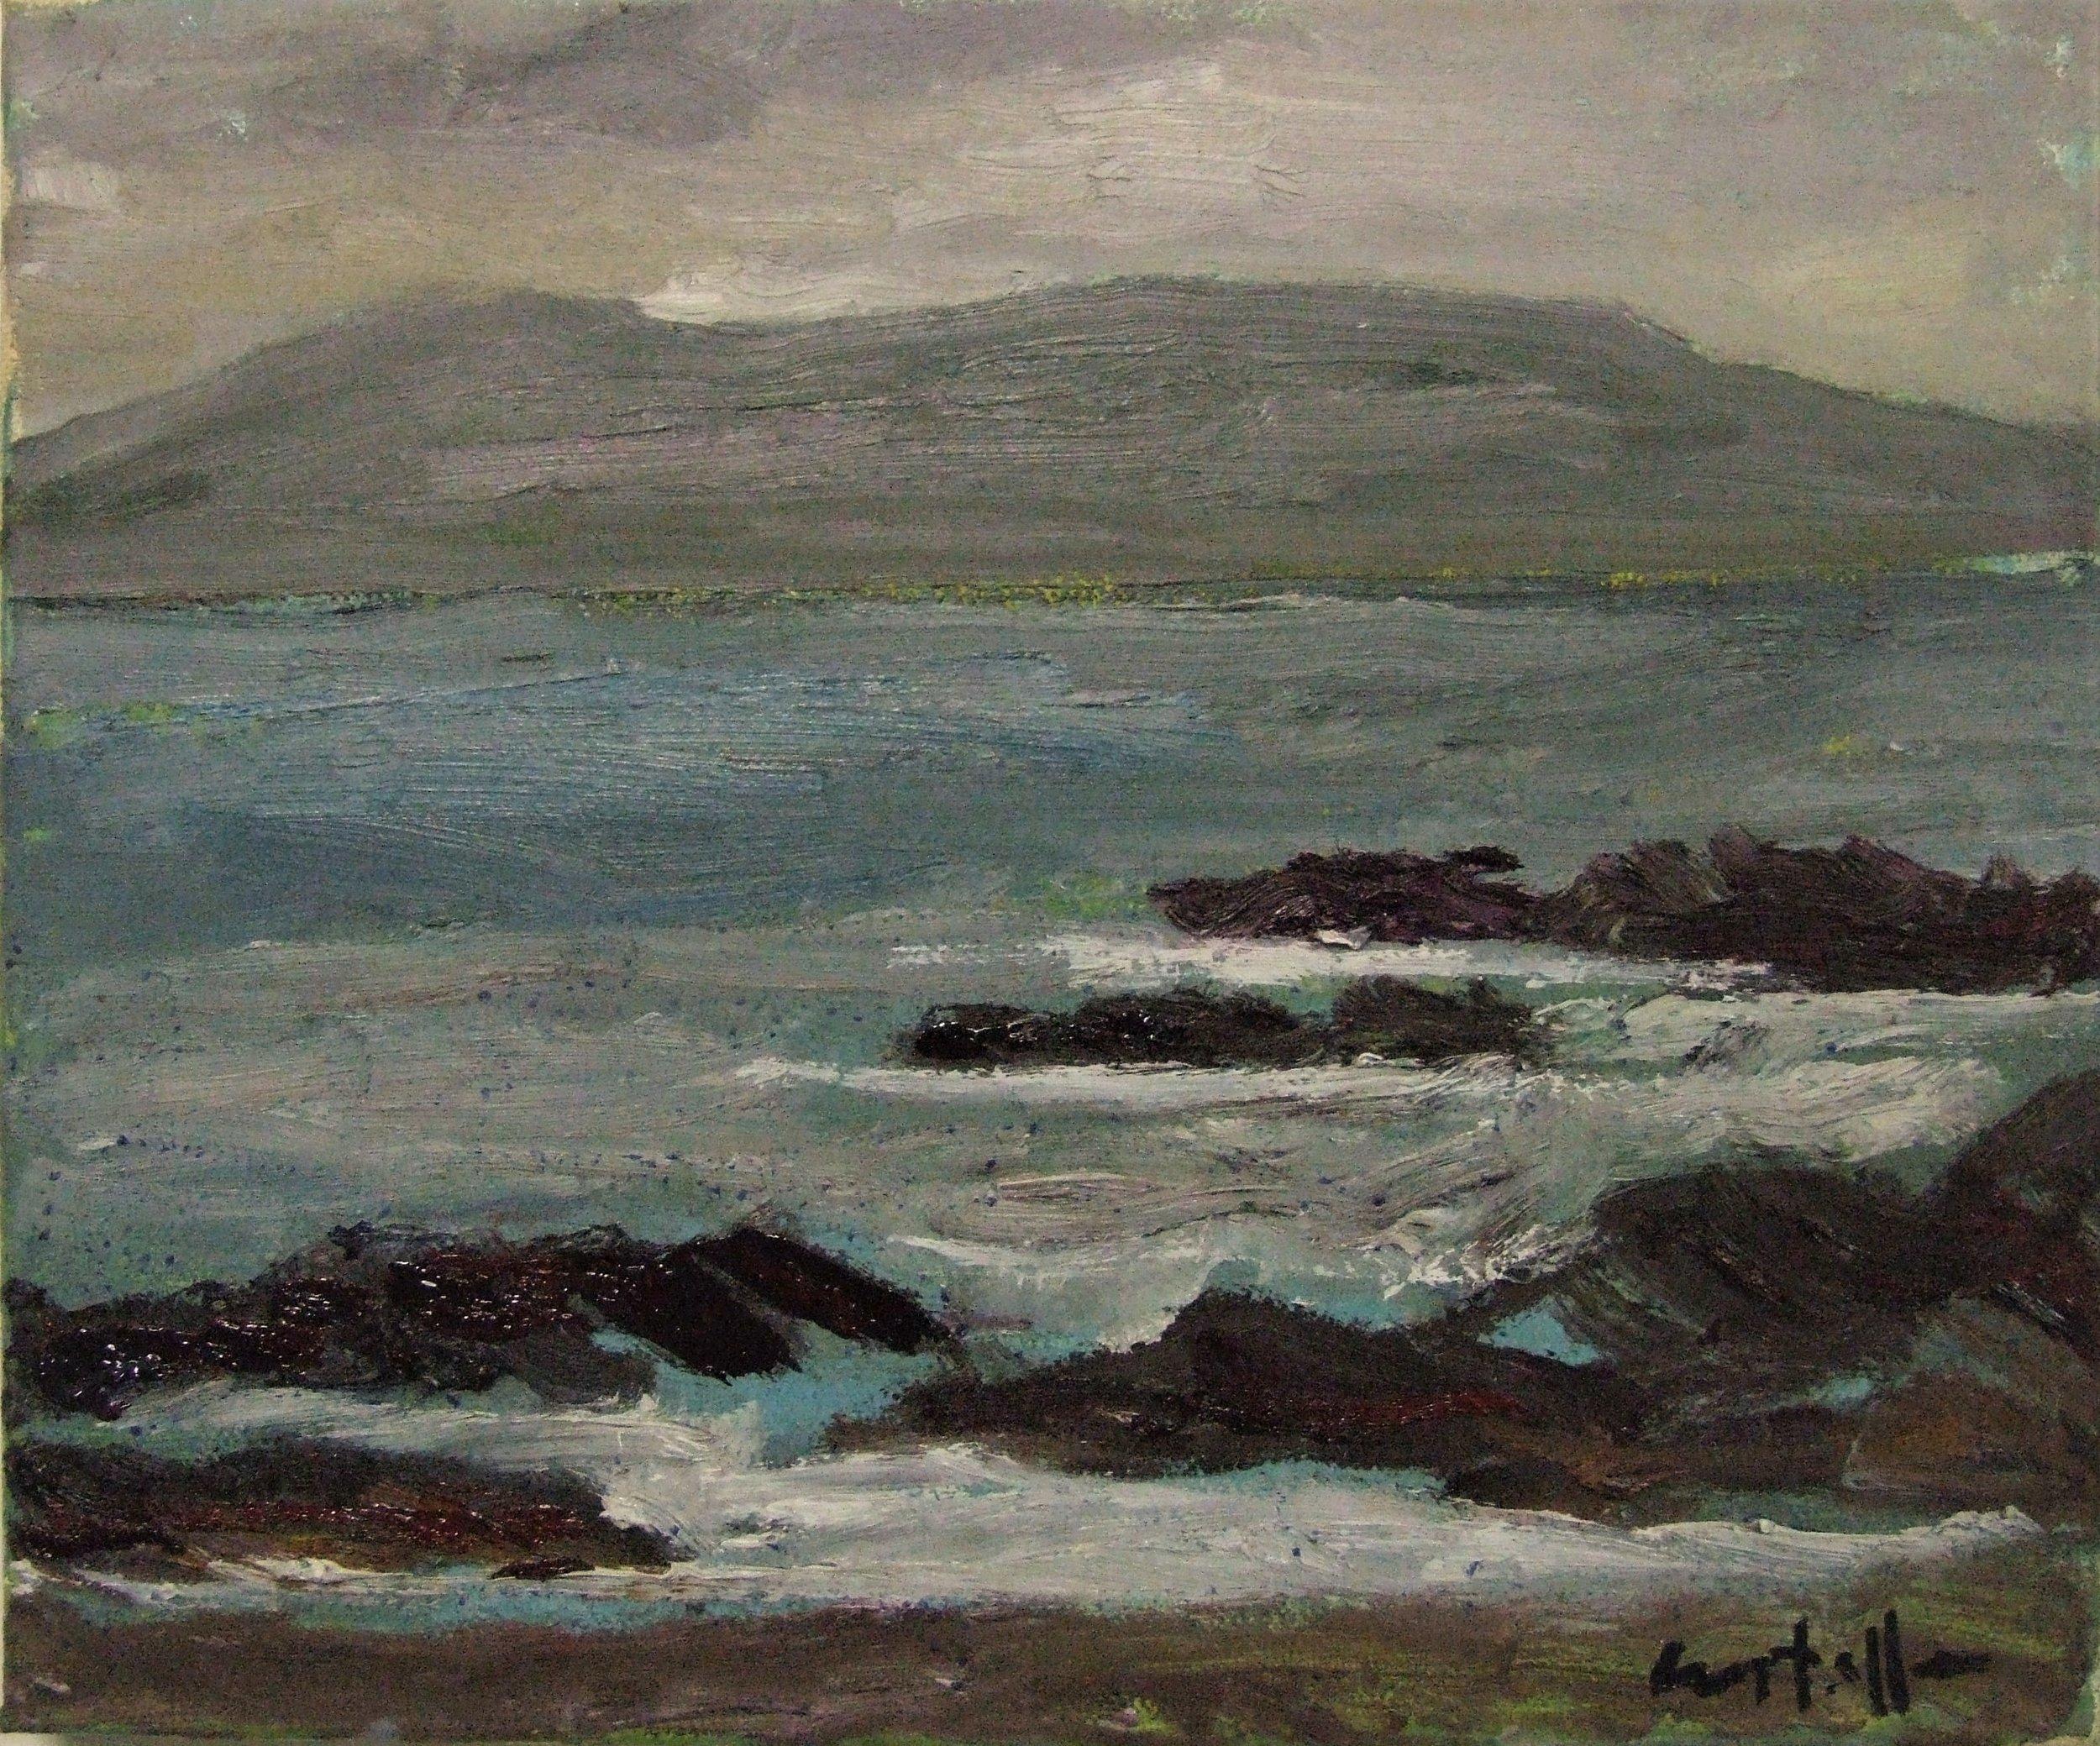 Grey mountain, 2016, oil on canvas, 25 x 30 cm